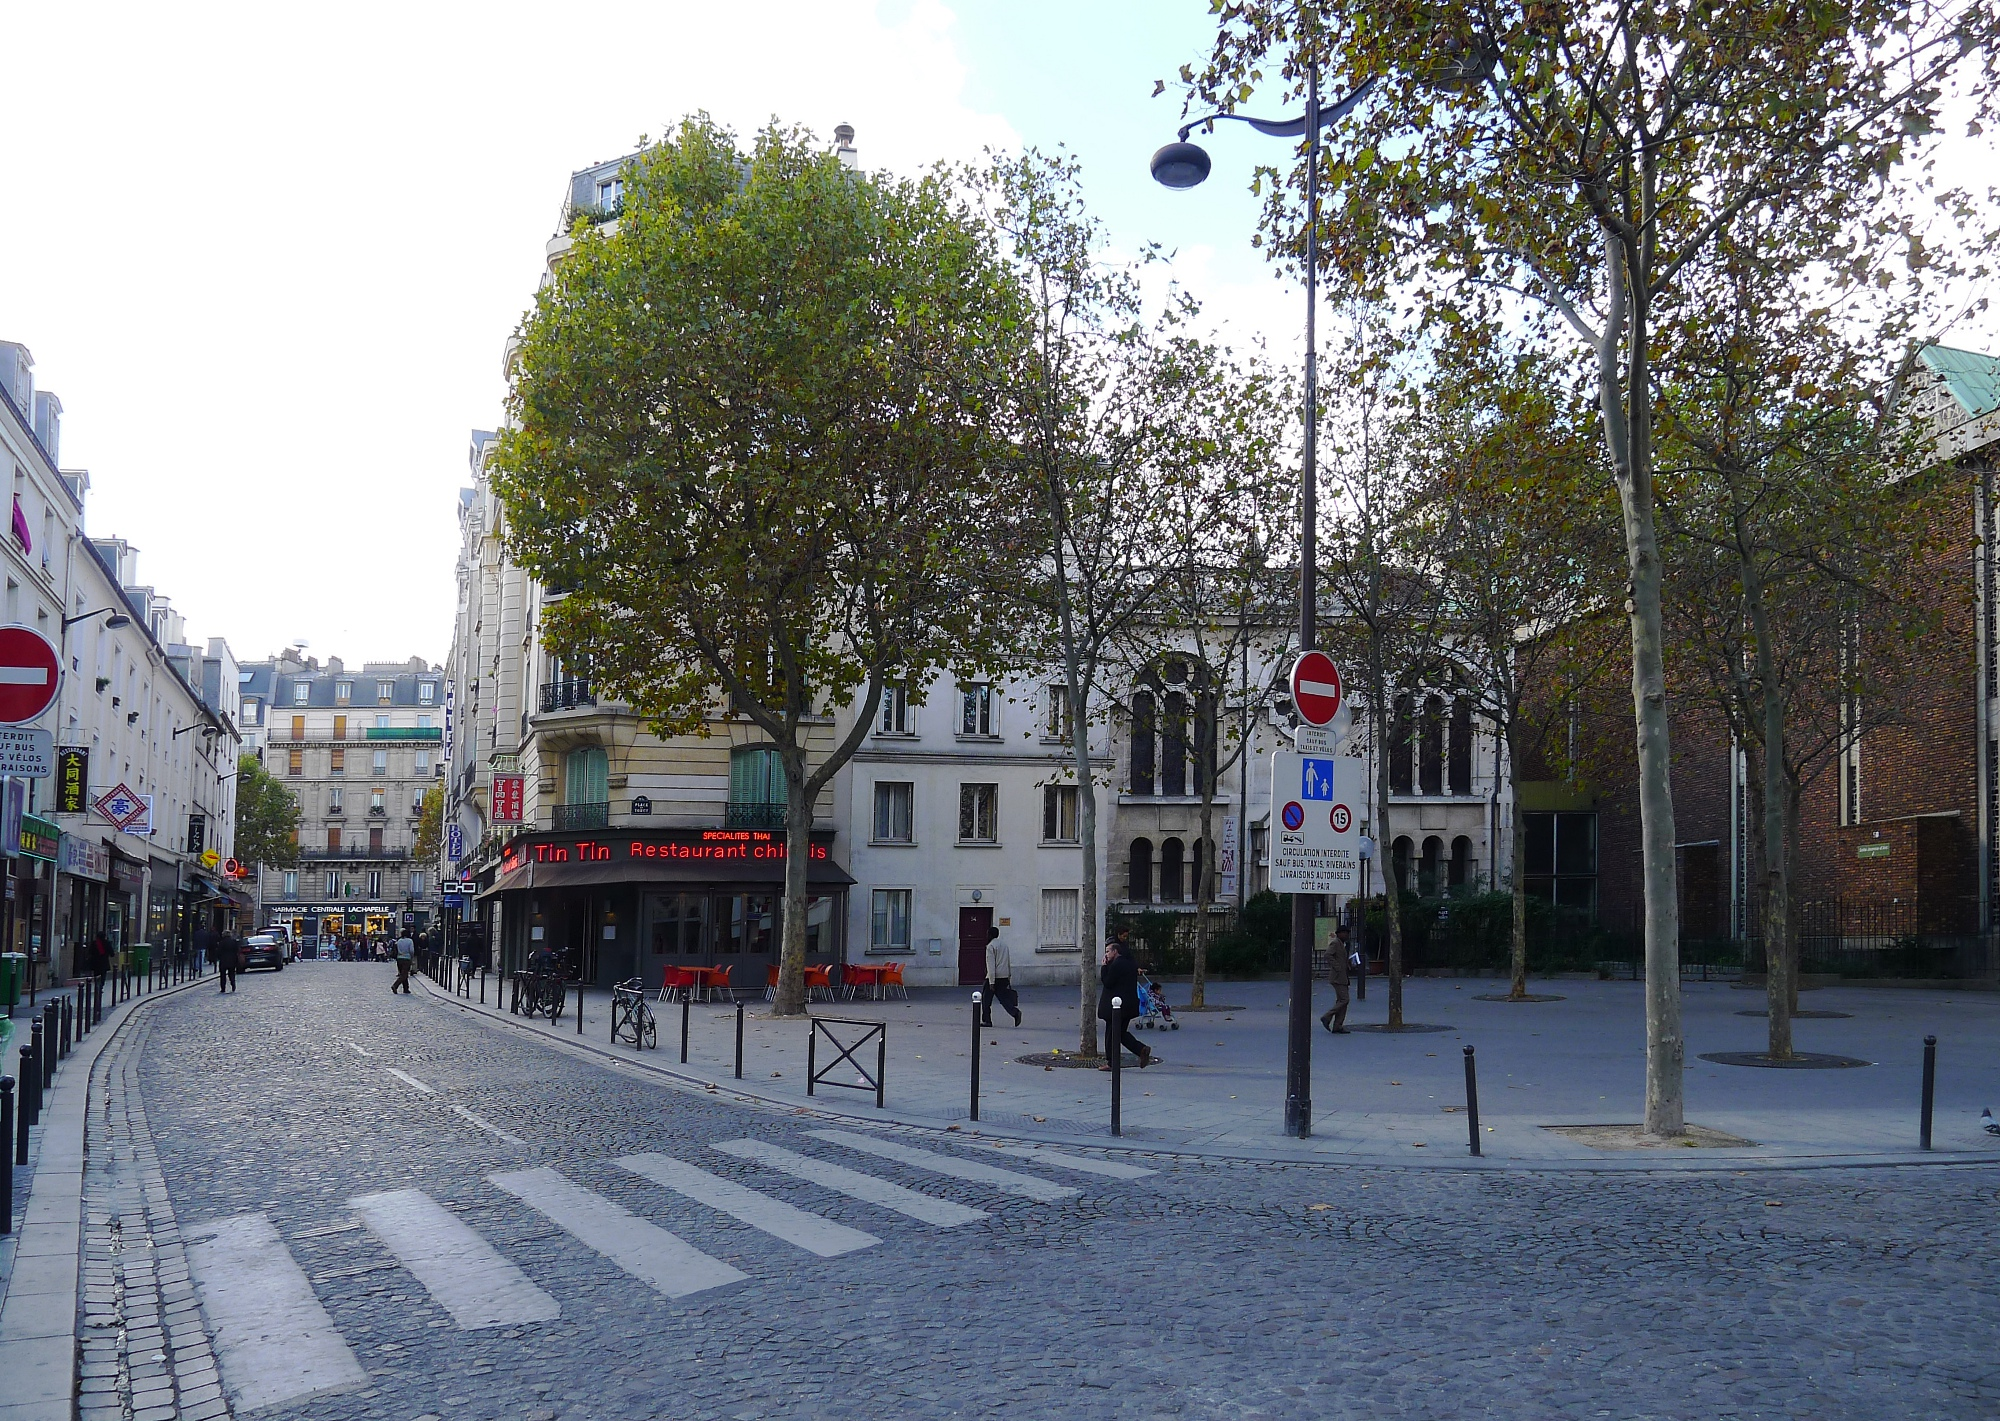 FileP1060155 Paris XVIII rue et place de Torcy rwk.jpg - Wikimedia Commons